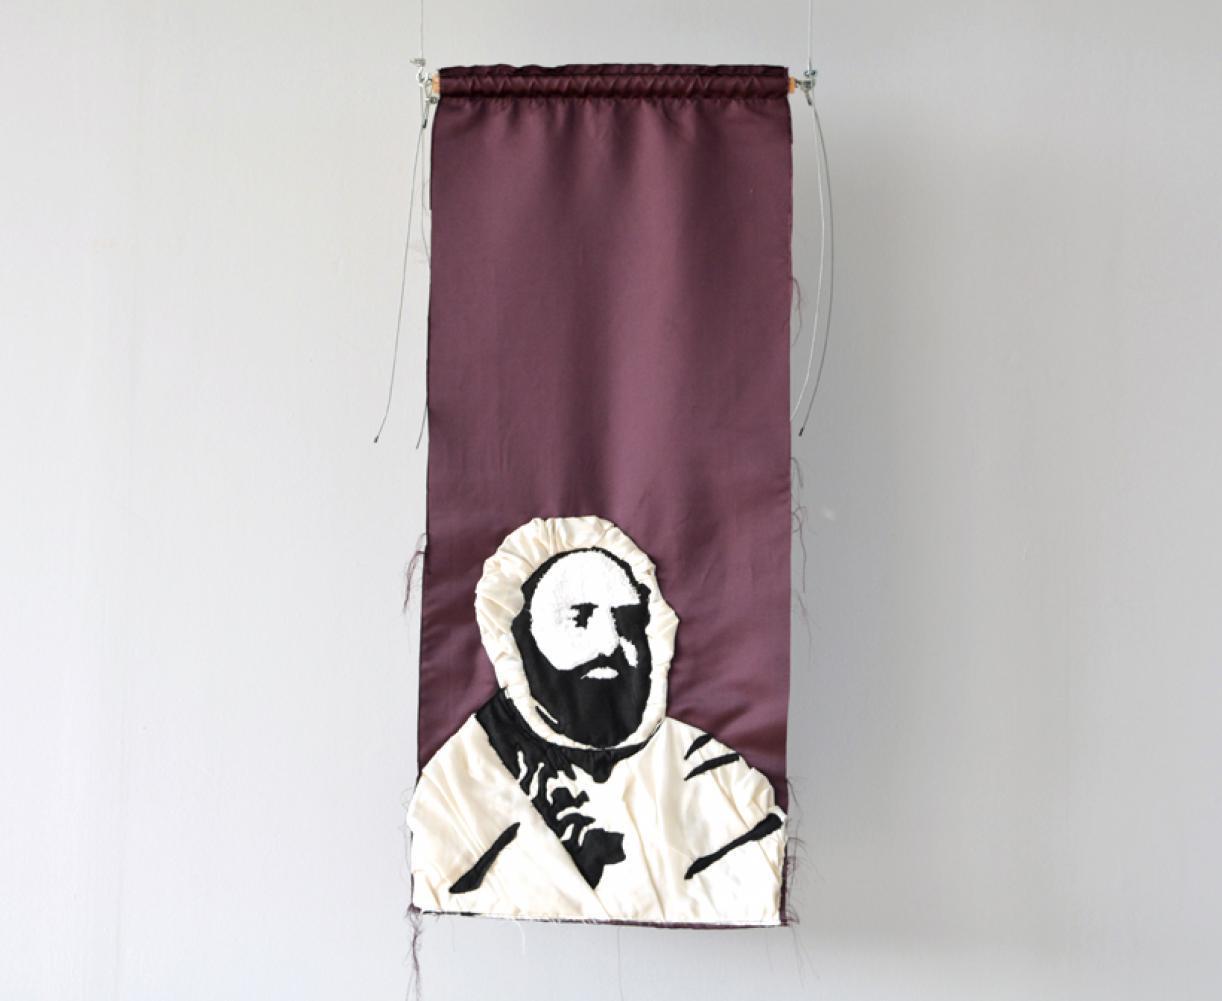 Blazon: Serail, Abdel Kadir El-Jazaqiri, 2015, Embroidery and applique on textile, 100 x 44 cm, Ed. 3 + 2 AP